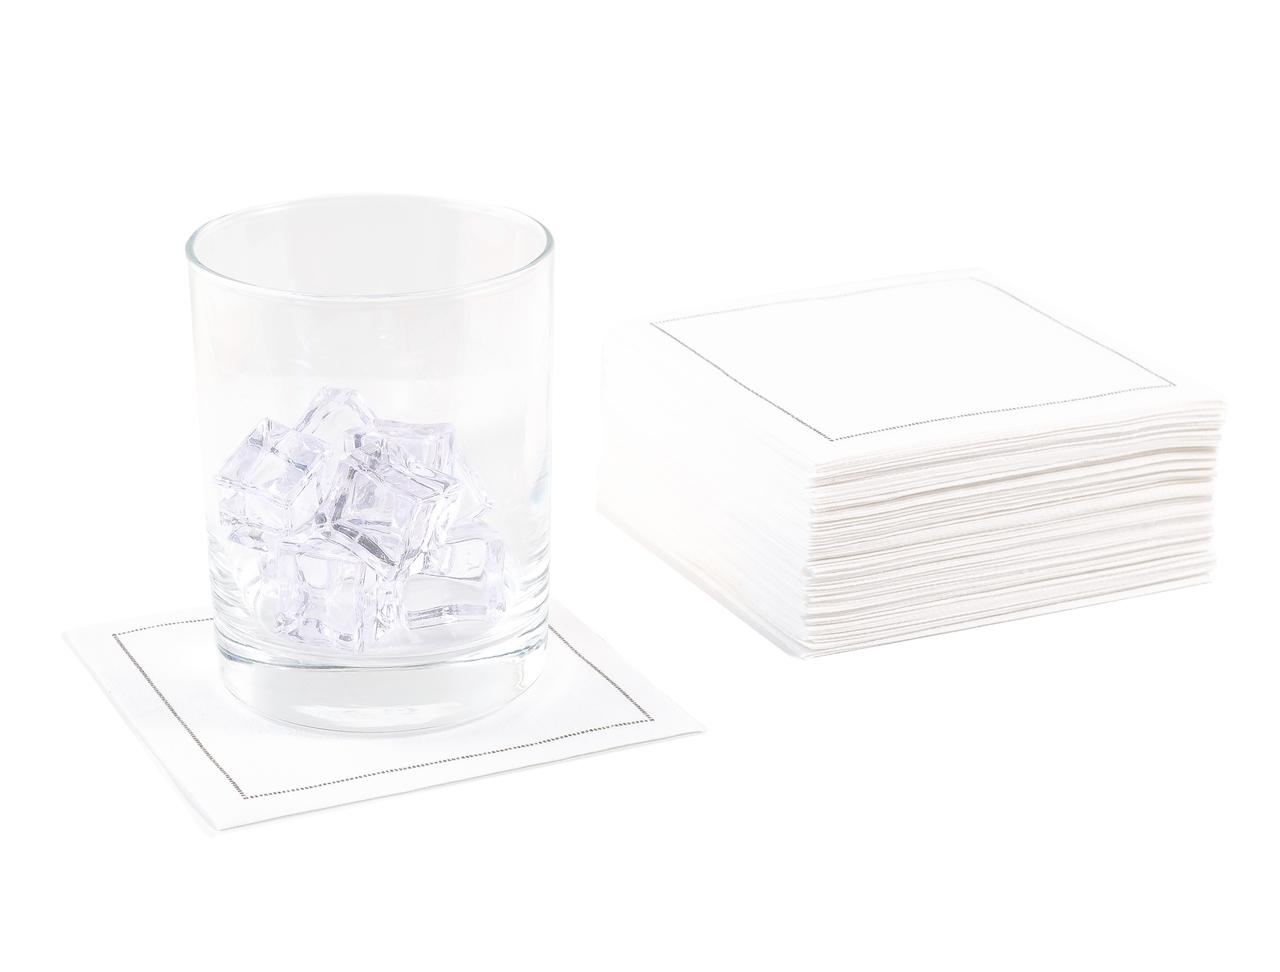 "White Cotton Cocktail Napkins (140 GSM)- 4.5"" x 4.5"" - 100 units"